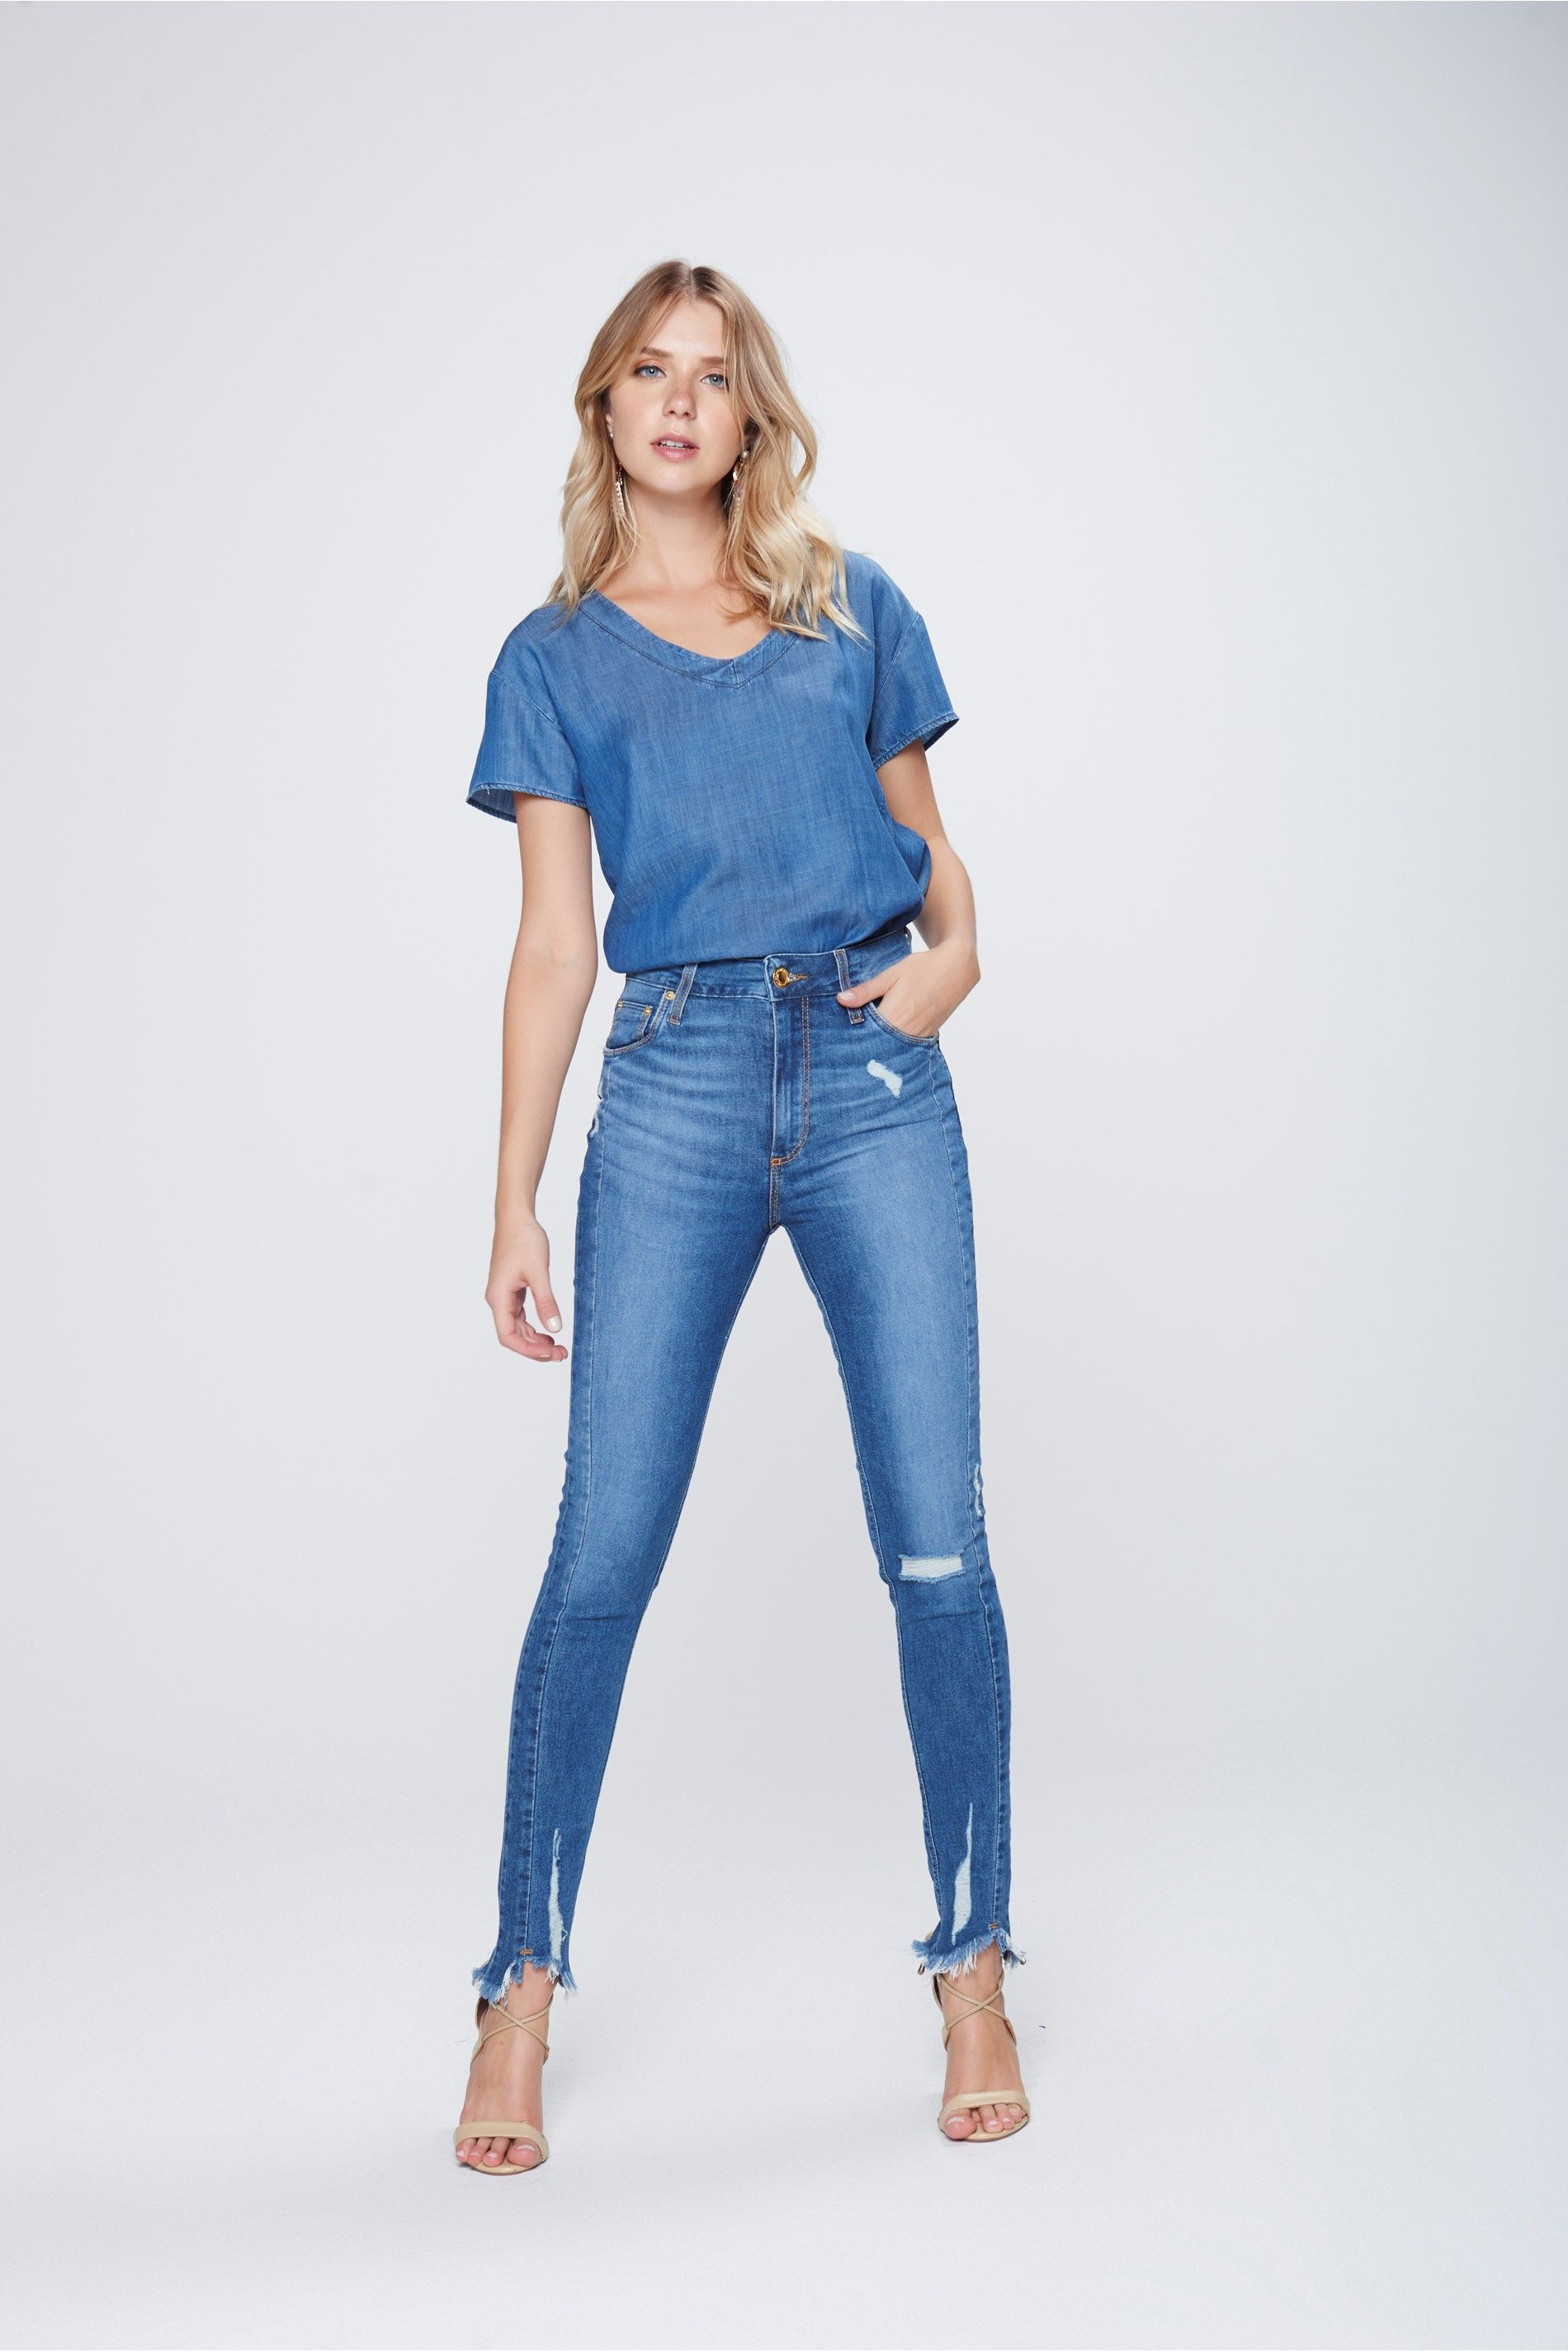 798db7c54b8 Calça Jeans Cigarrete Feminina - Damyller